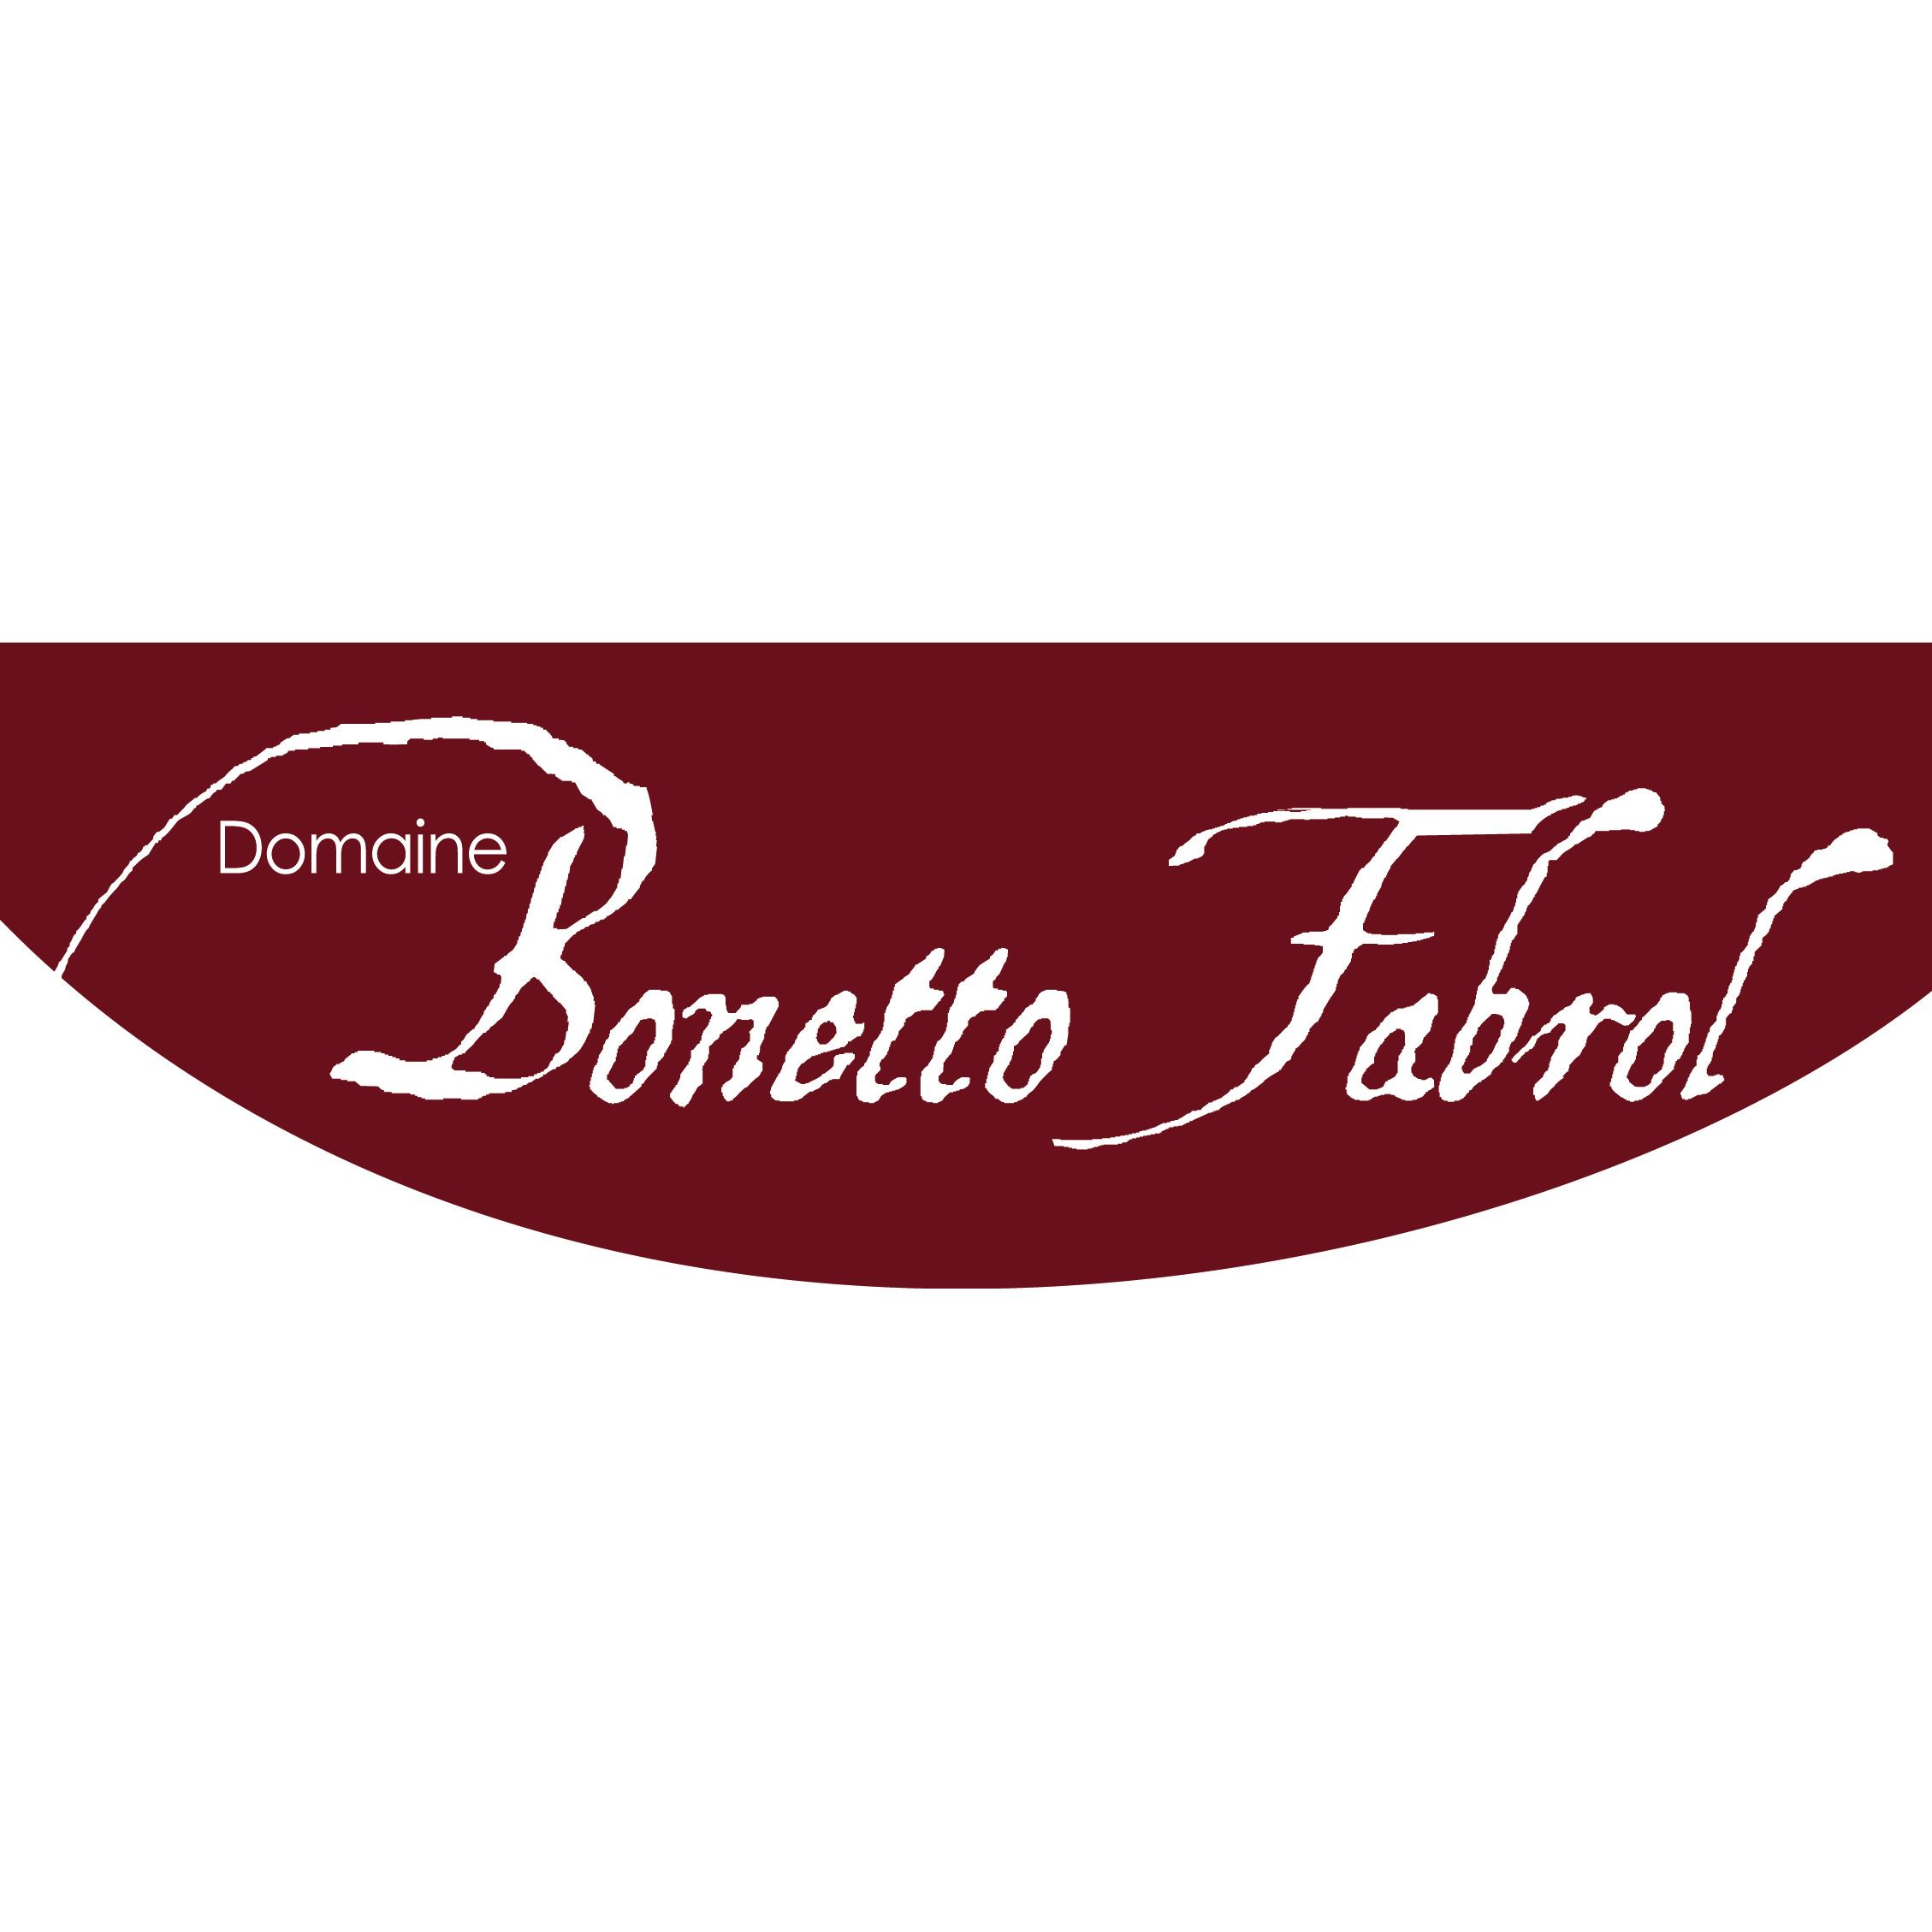 logo-bonetto fabrol-imprimerie-burinter-pierrelatte